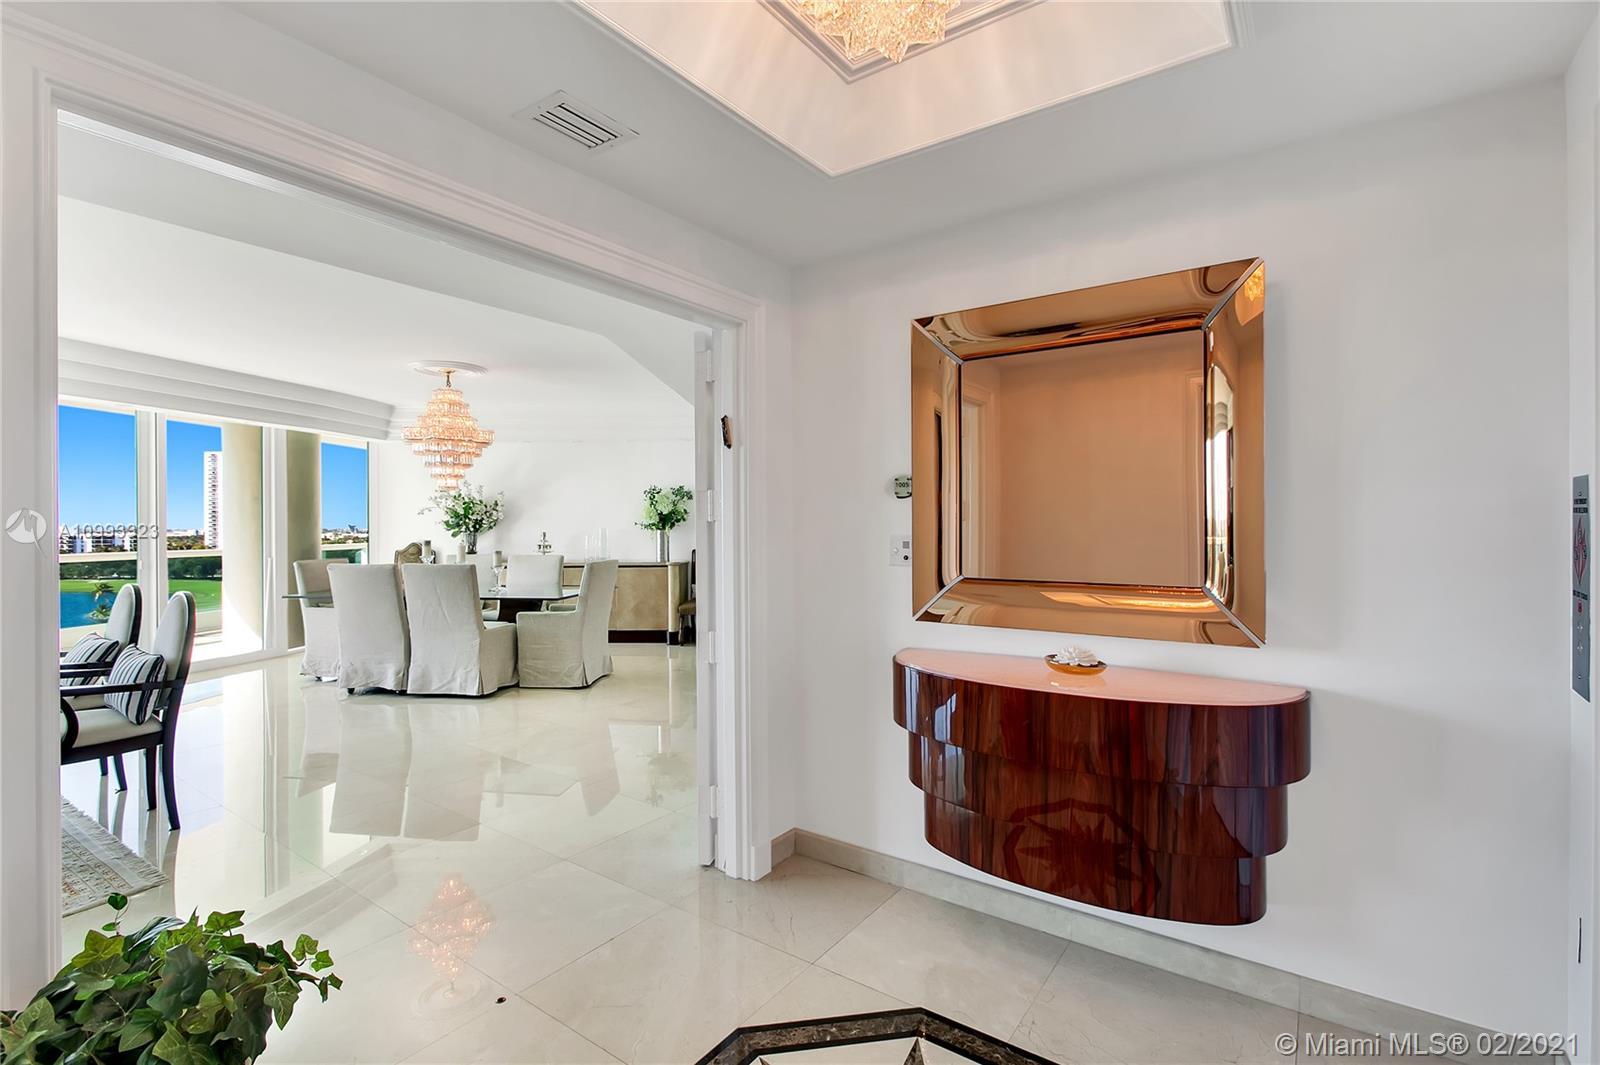 Photo of 20155 38th Ct #1005, Aventura, Florida, 33180 -